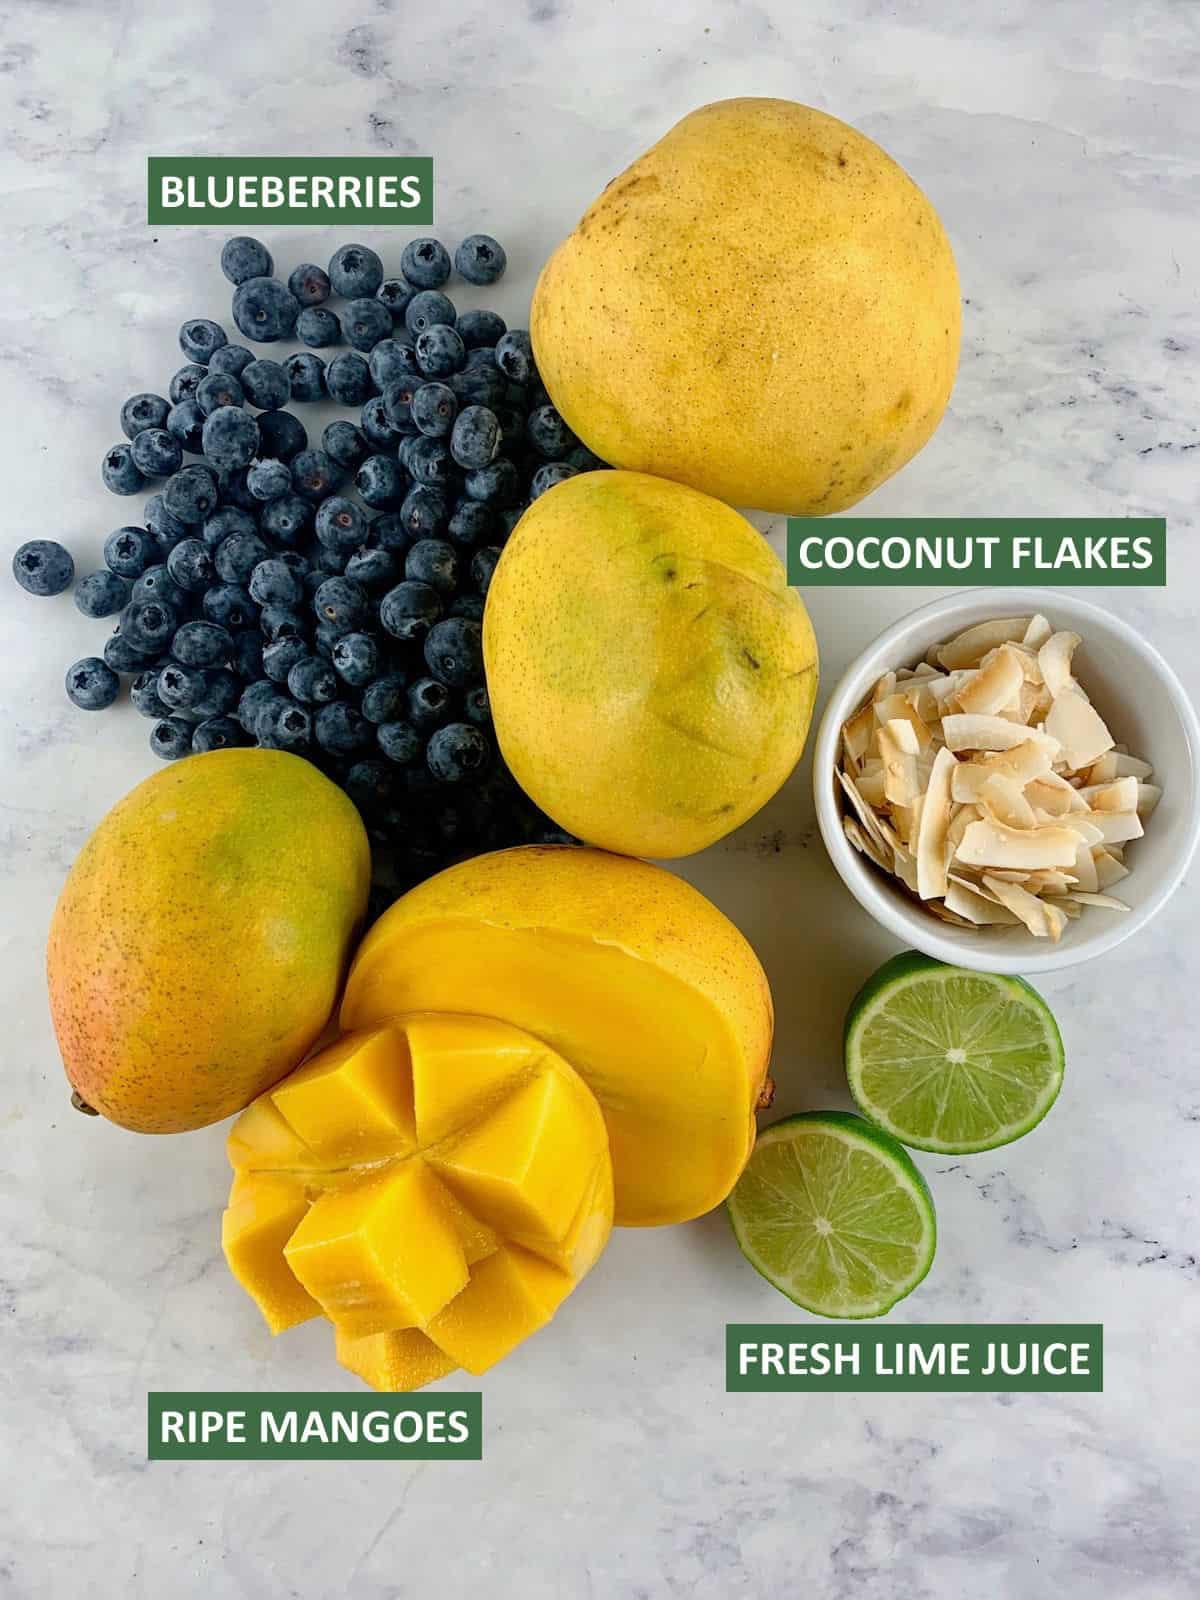 LABELLED INGREDIENTS NEEDED TO MAKE MANGO FRUIT SALAD